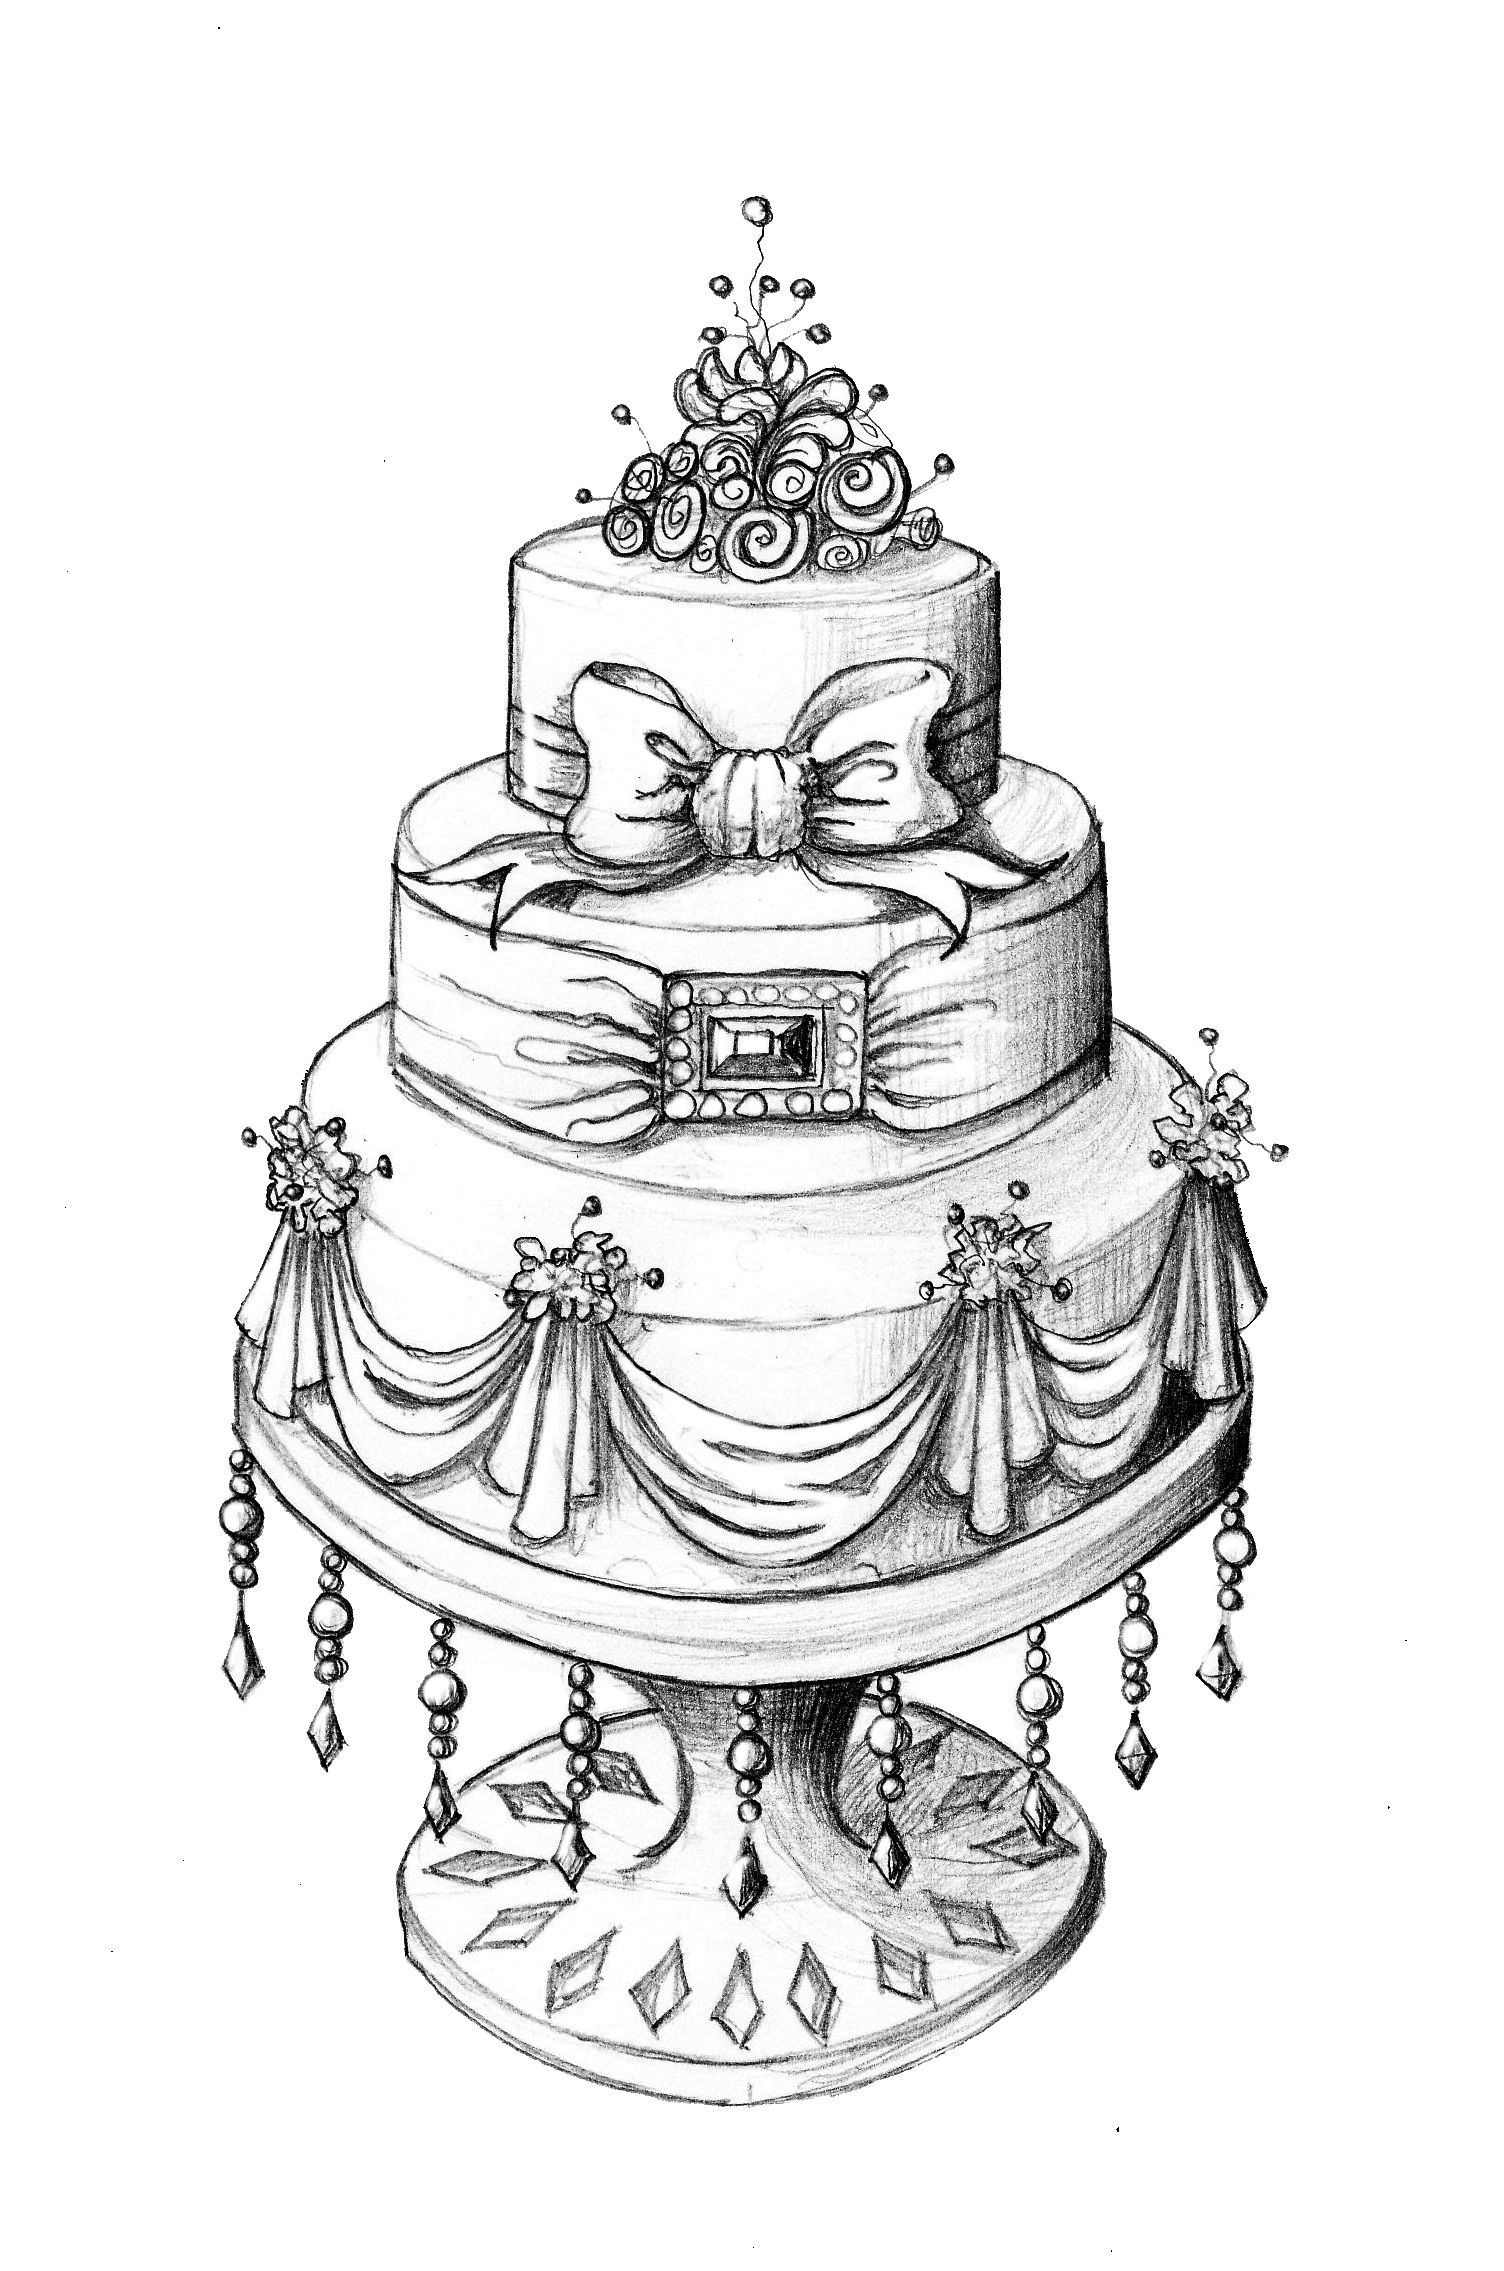 Cake Sketches